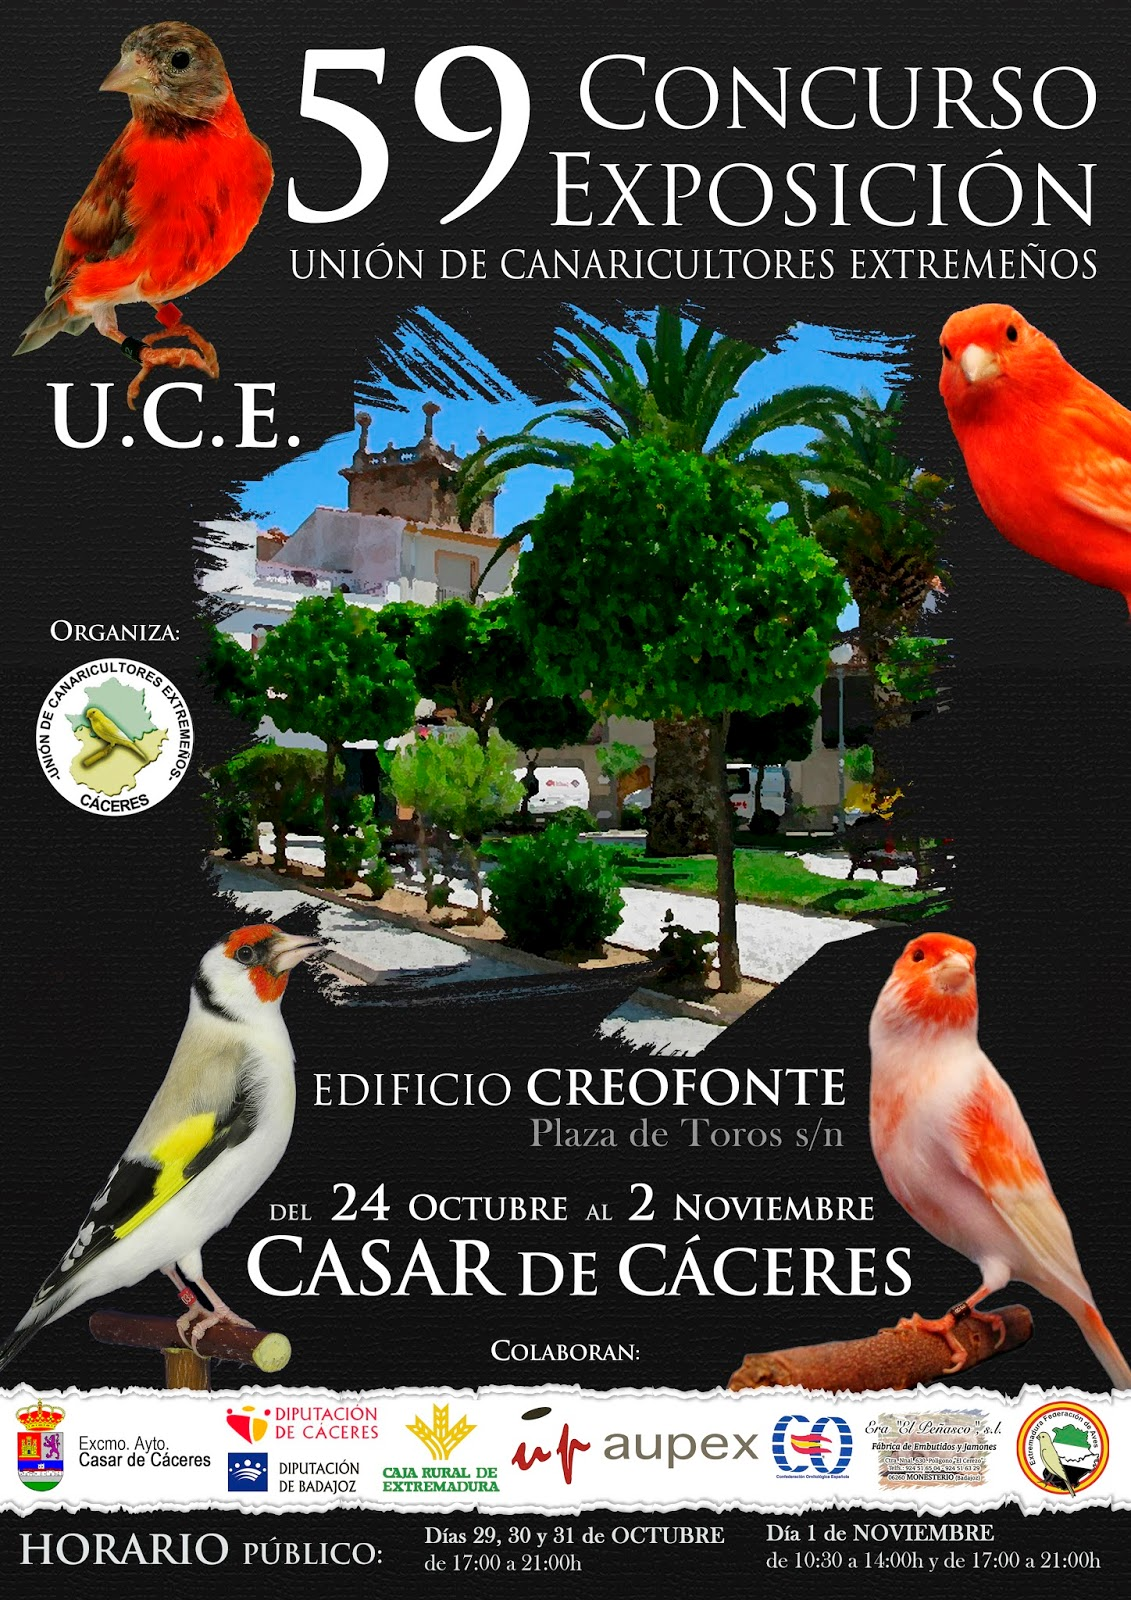 http://canaricultores.wordpress.com/2014/09/24/59o-concursoexposicion-u-c-e-calendario-bases-e-inscripciones/